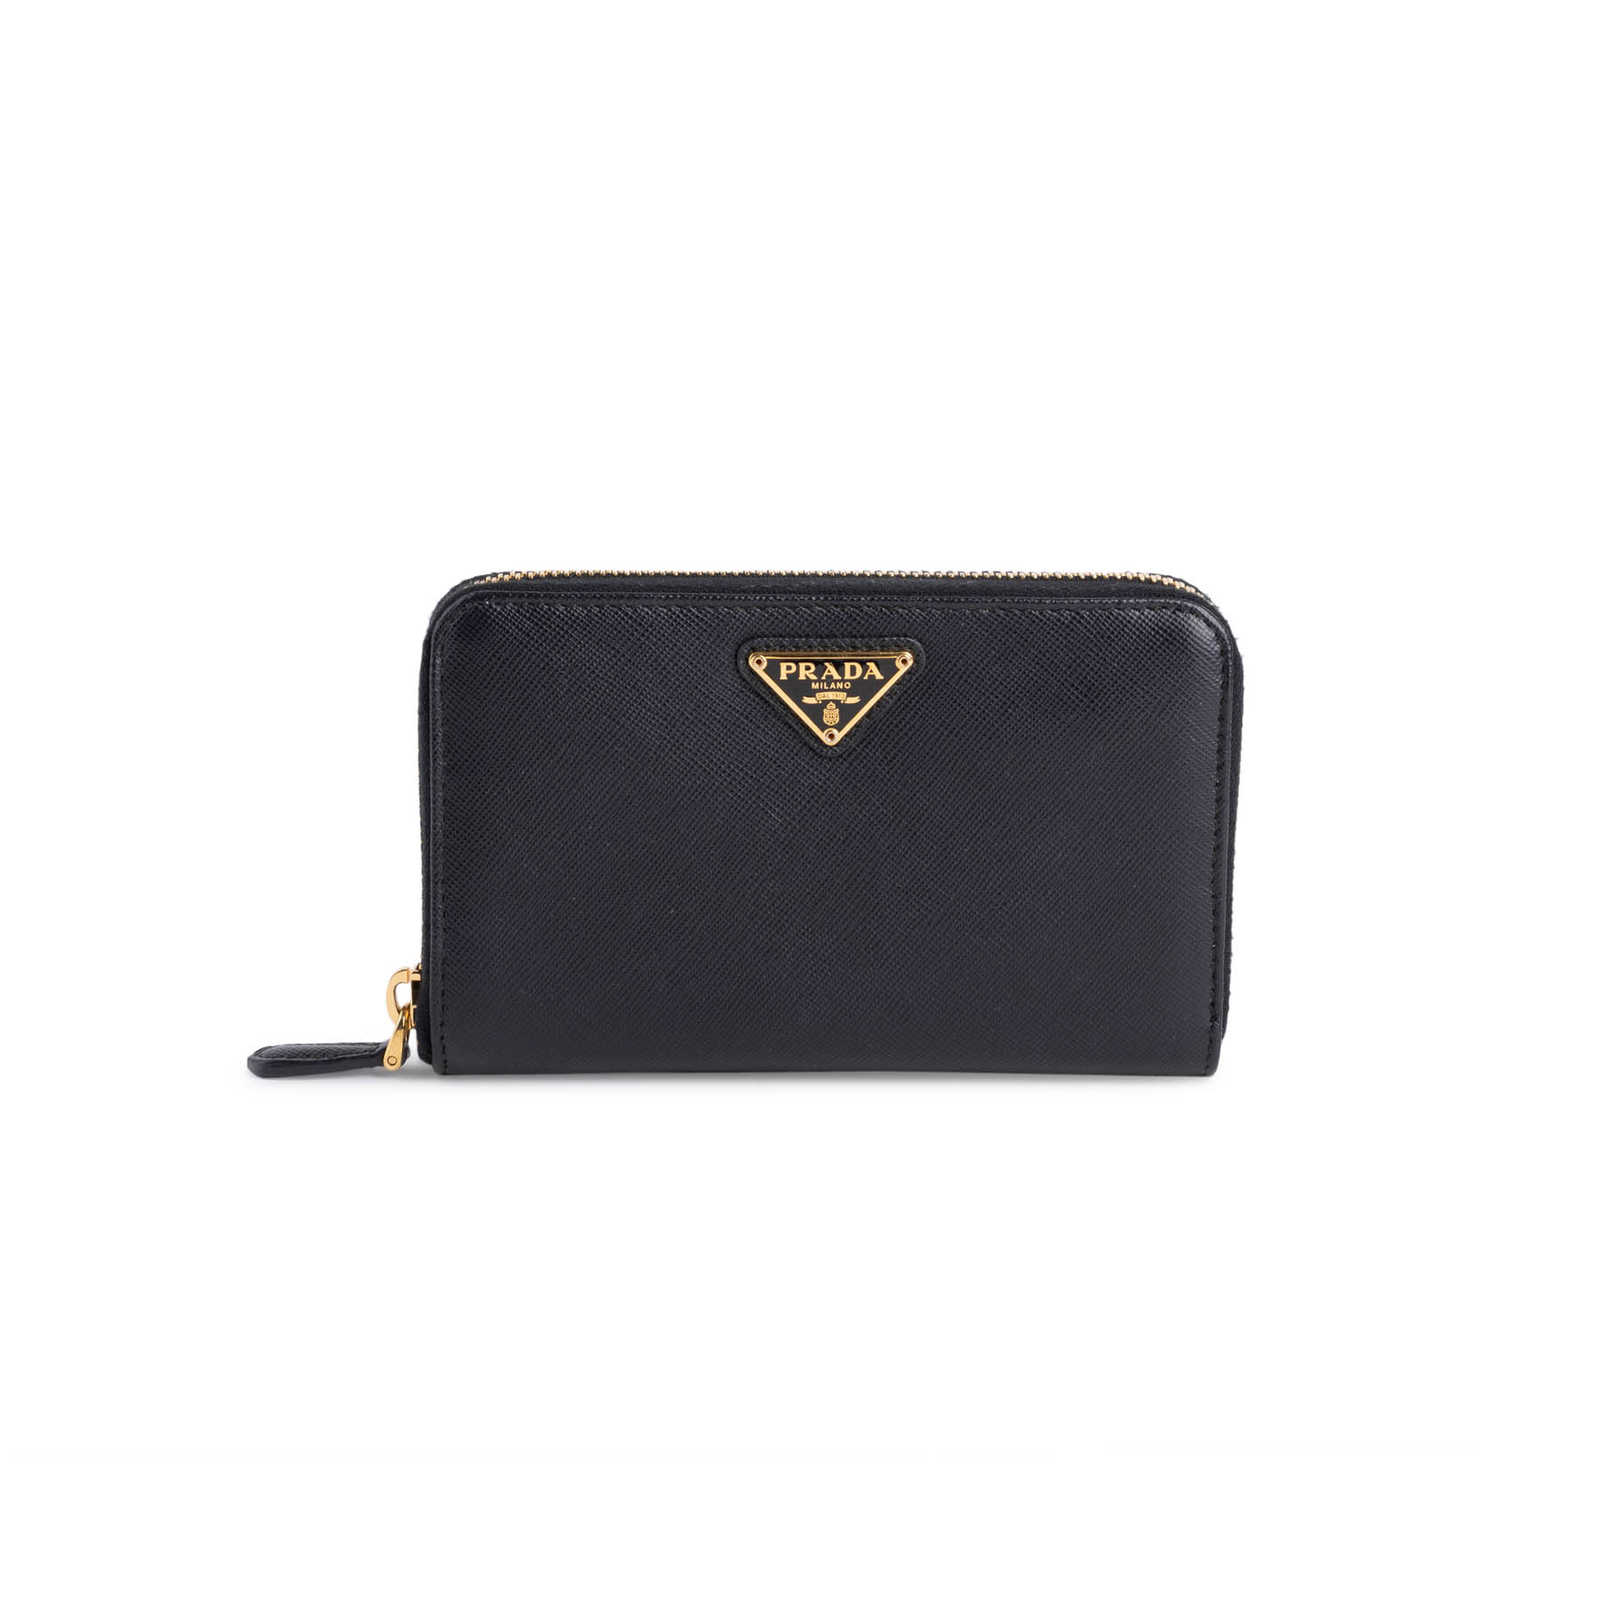 da1eb01e Authentic Second Hand Prada Saffiano Zip Around Wallet (PSS-718 ...